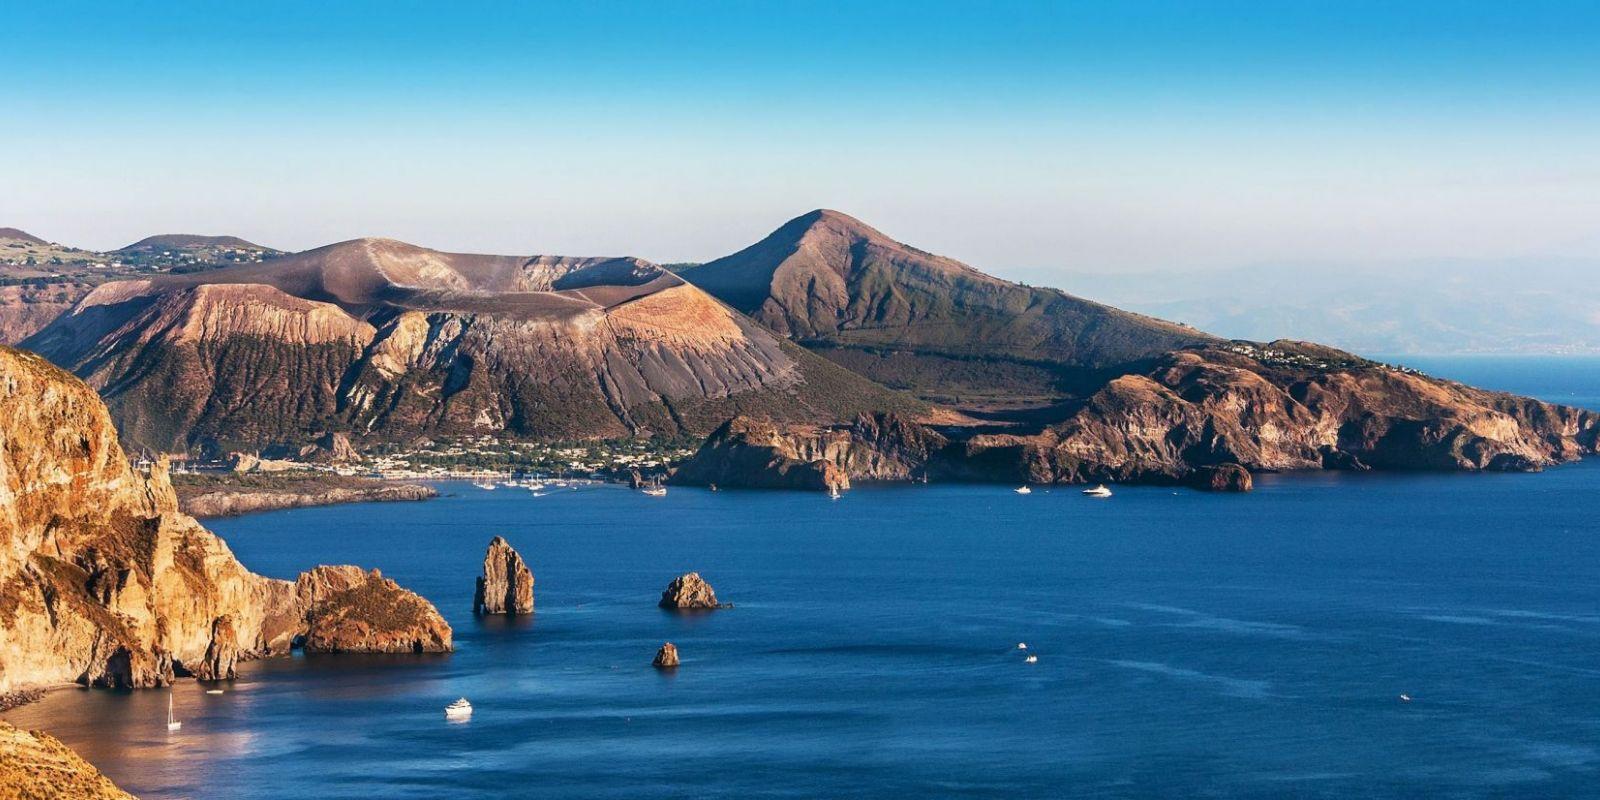 https://www.talamare.com/medias/Yacht charter Aeolian islands  Yacht rental Aeolian Sicily